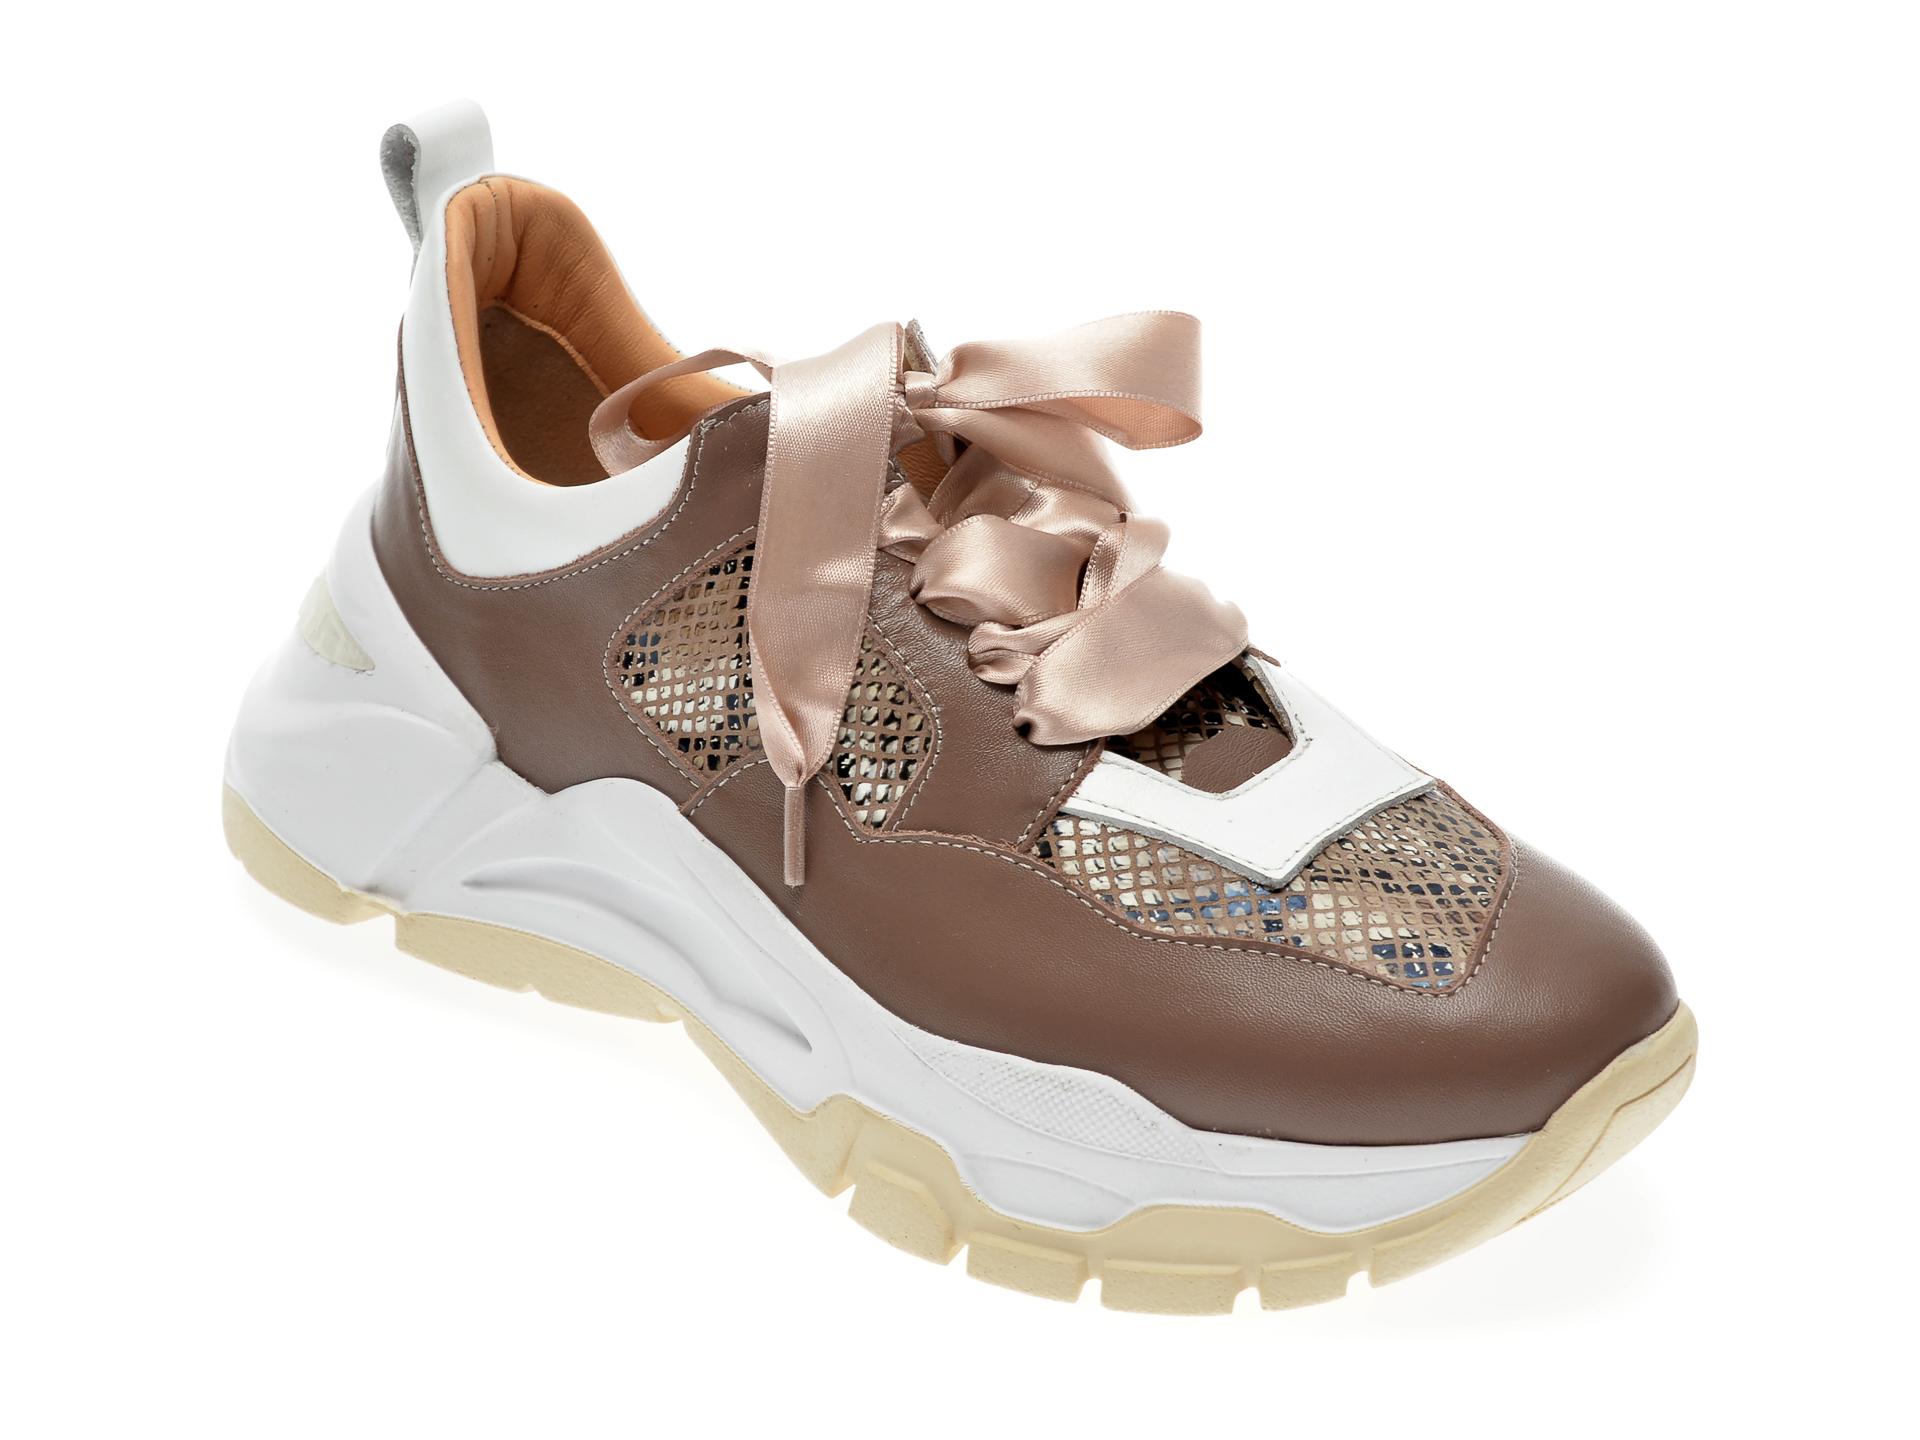 Pantofi sport EPICA maro, 135P240, din piele naturala imagine 2021 Epica